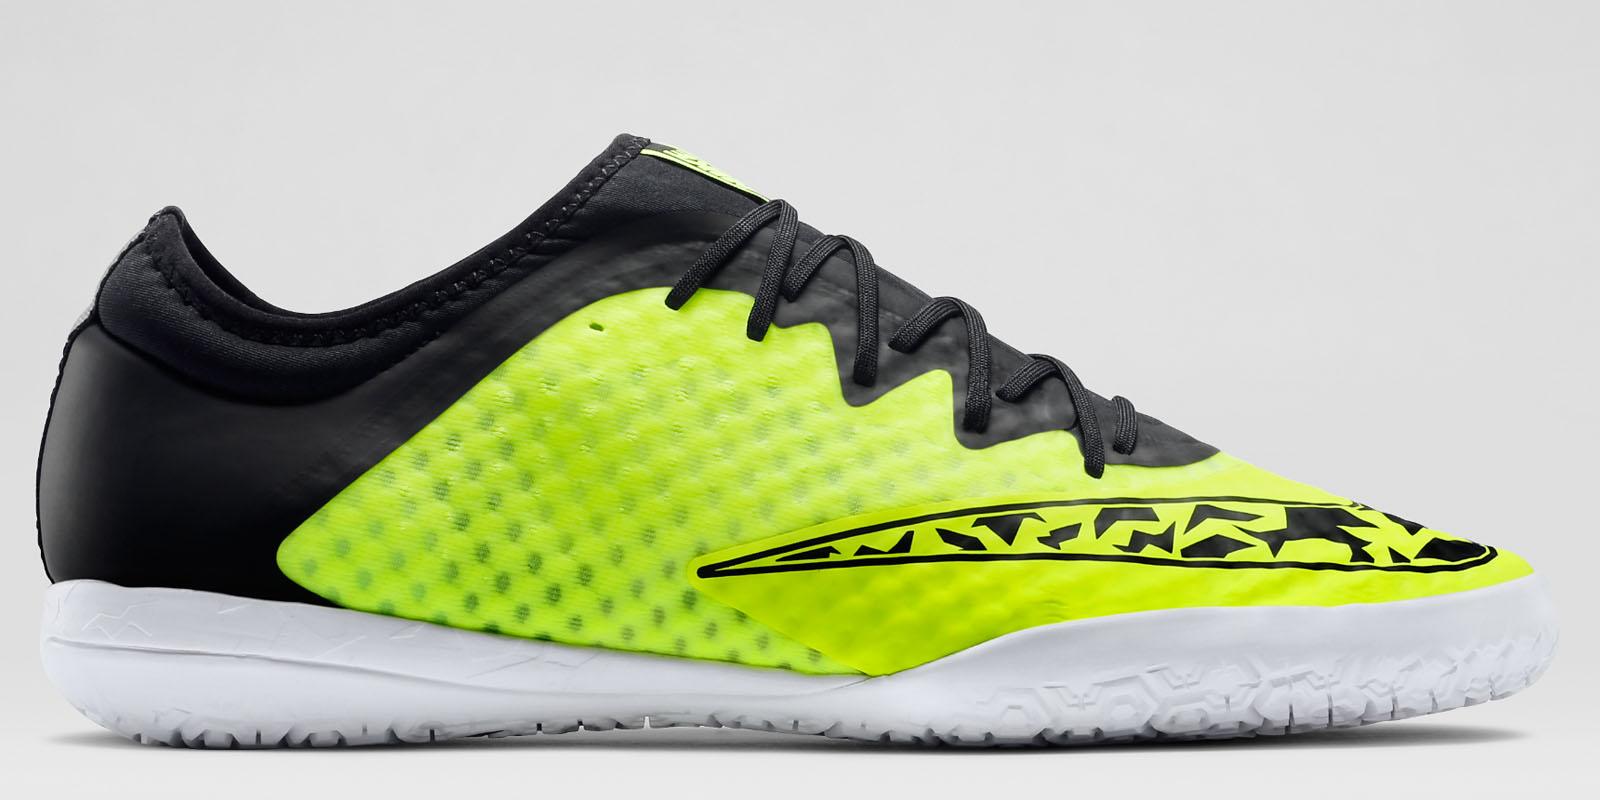 Nike Elastico Finale Iii Ic Indoor Soccer Shoes